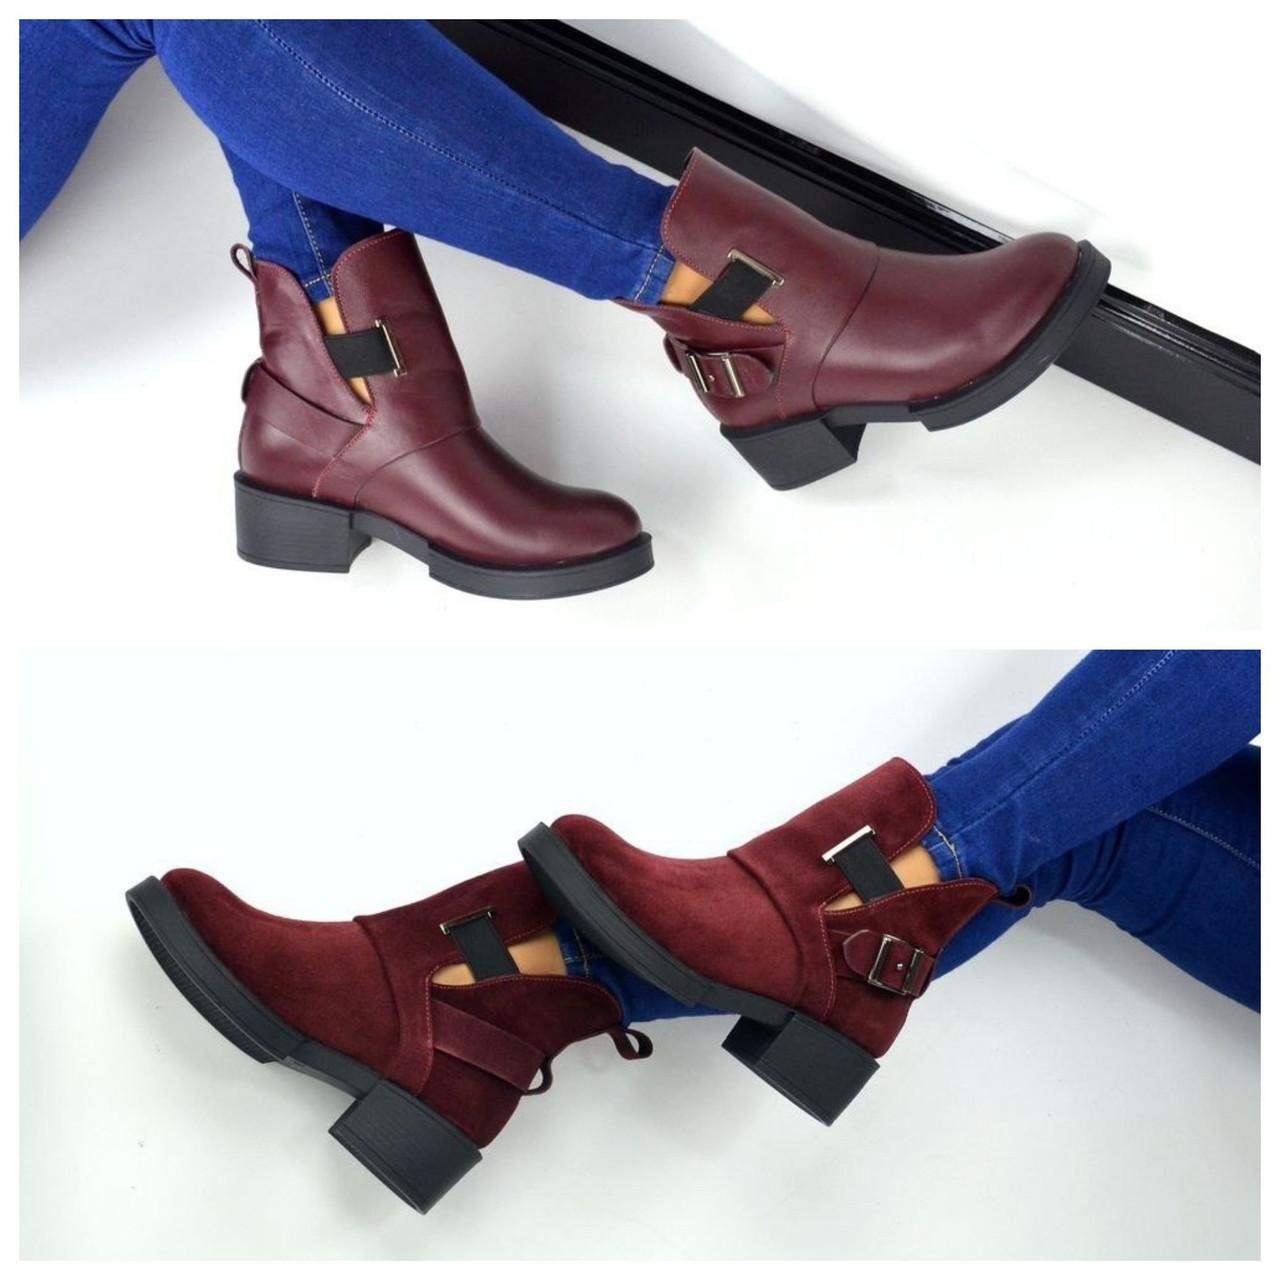 Ботинки Hermes, Натуральный замш, натуральная кожа цвет - МАРСАЛА, зима  натуральная кожа, a467c80f986